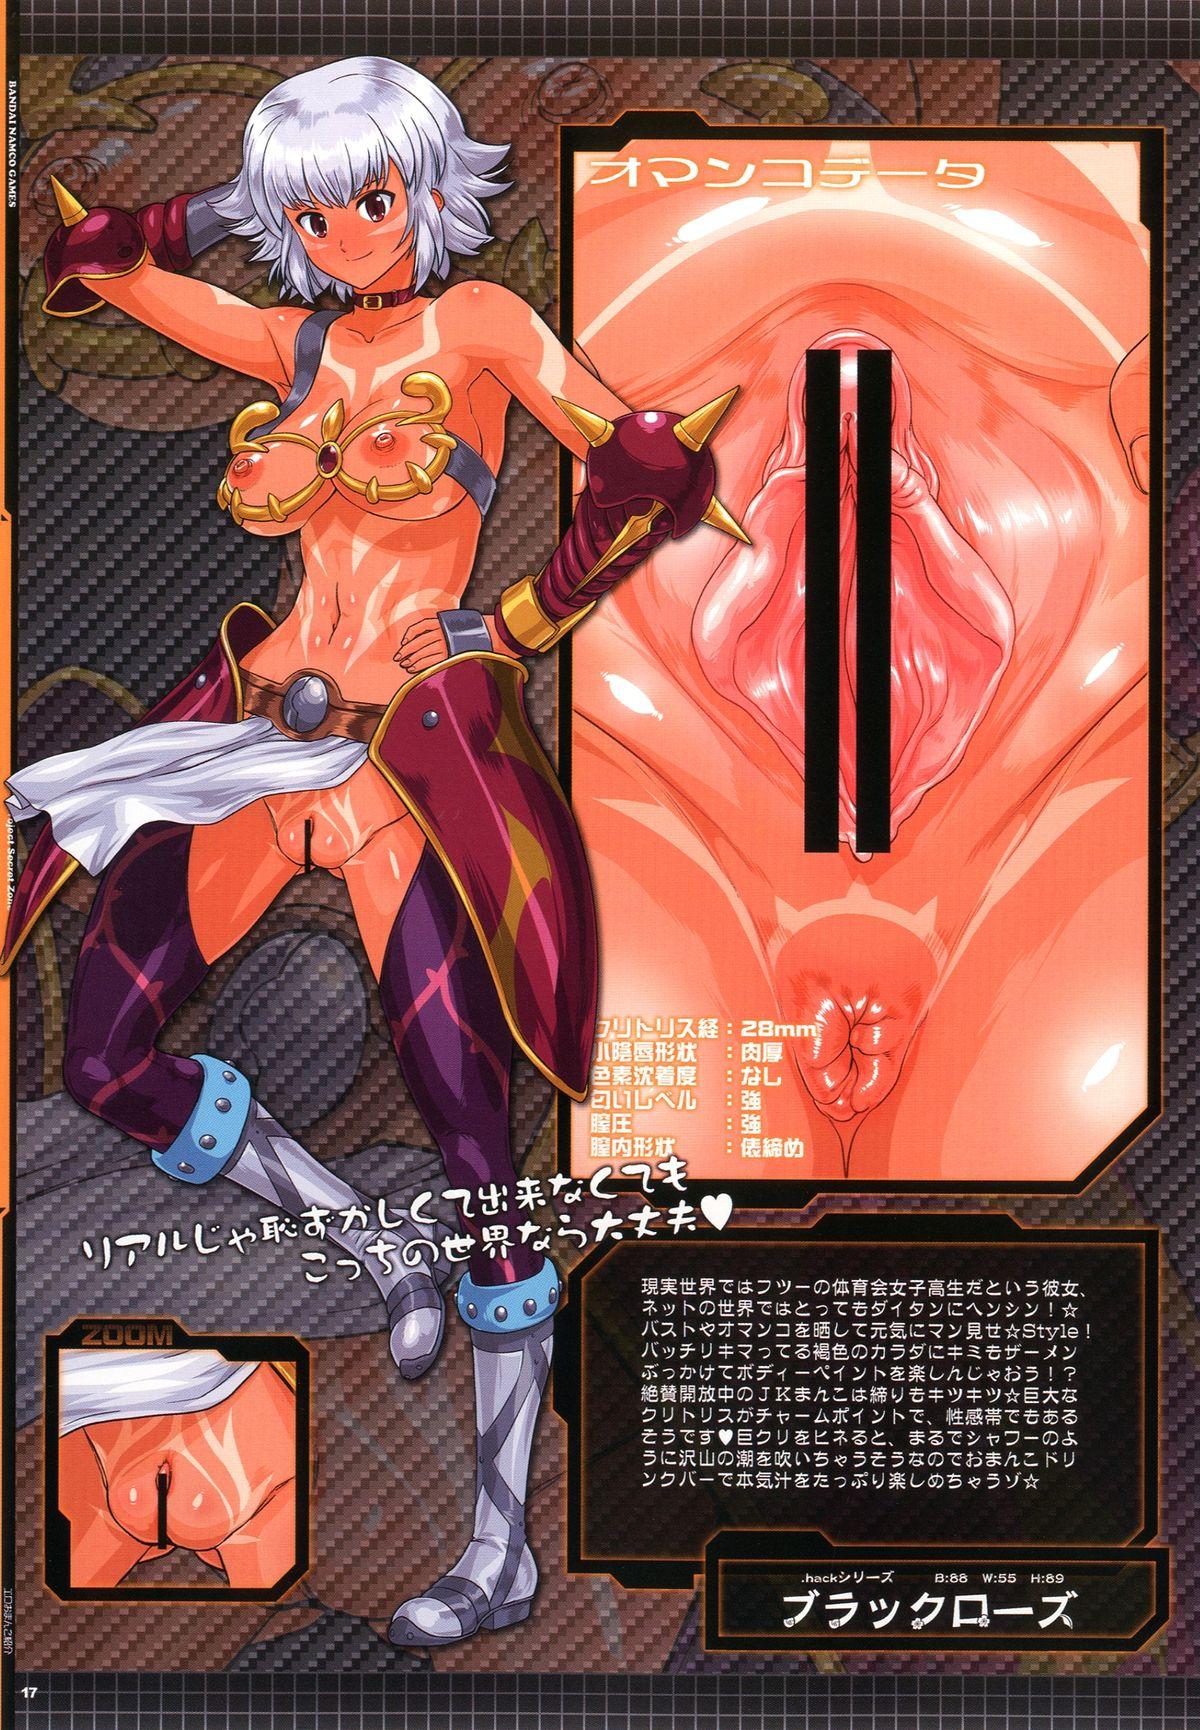 armor gu black .hack Miss kobayashi's dragon maid e621